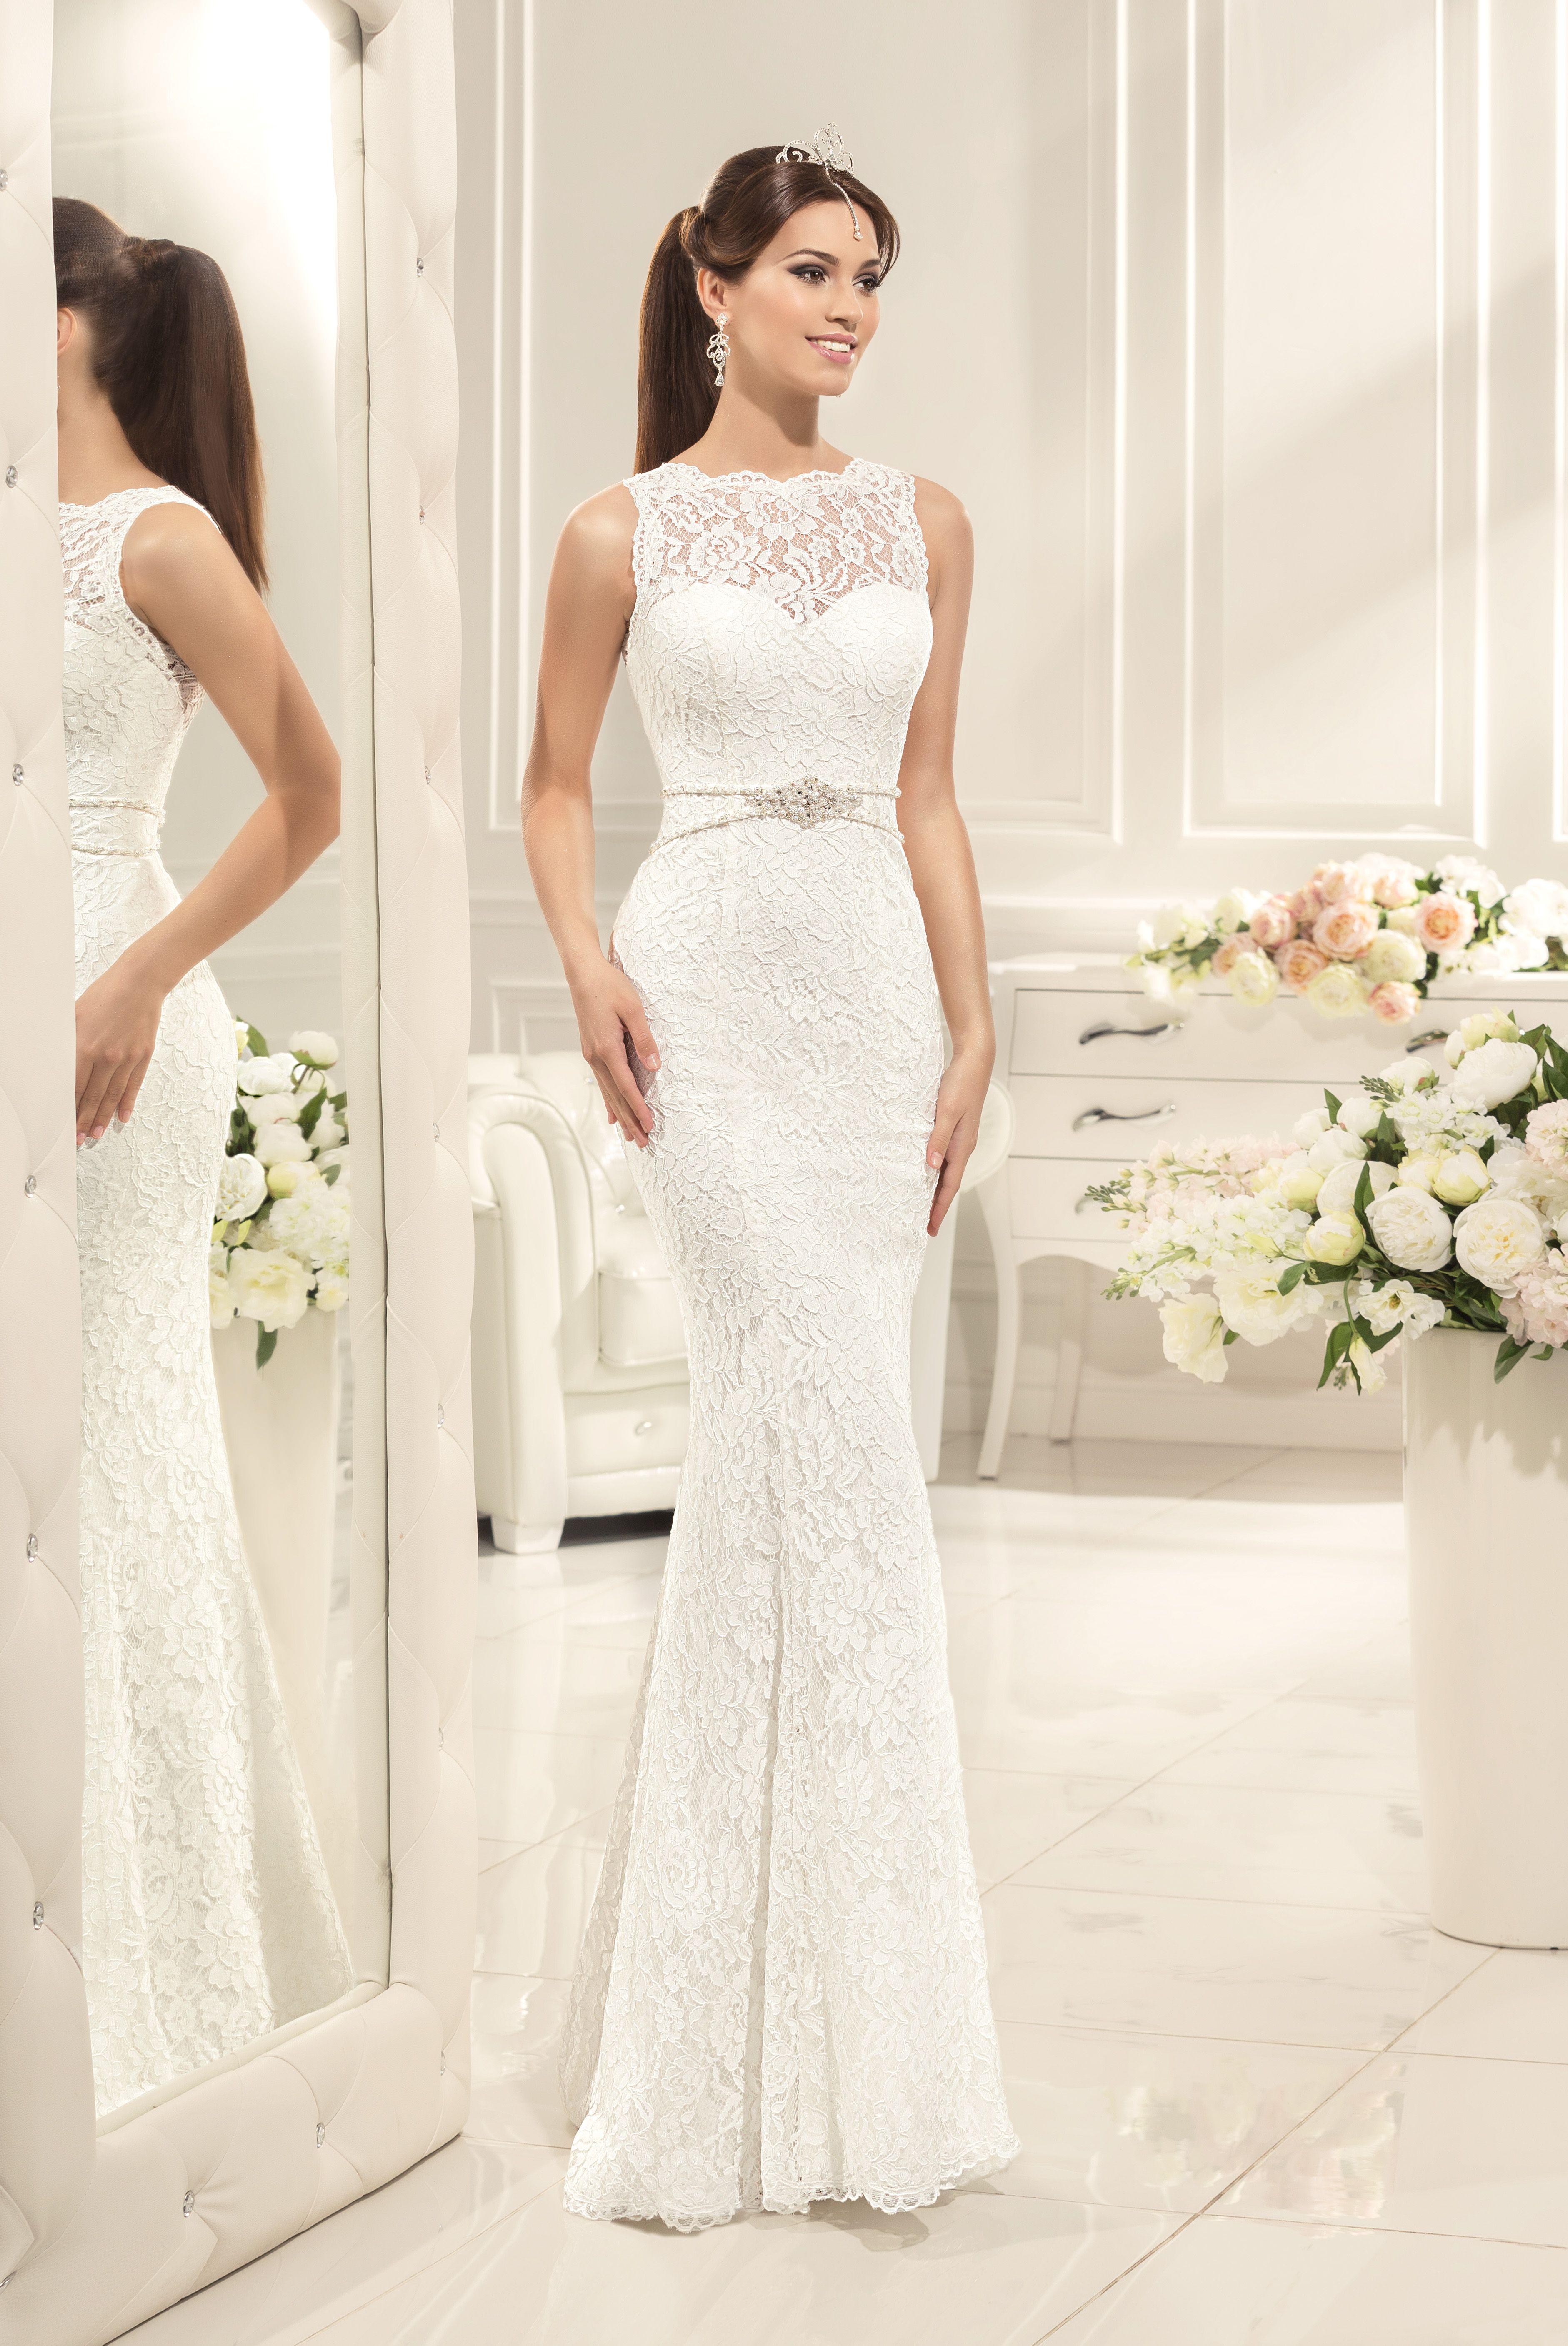 nora naviano 1 Ñ Ð Ð Ð ÐµÐ Ð Ð Ðµ Ð Ð Ð Ñ Ñ Ðµ nora naviano wedding dress